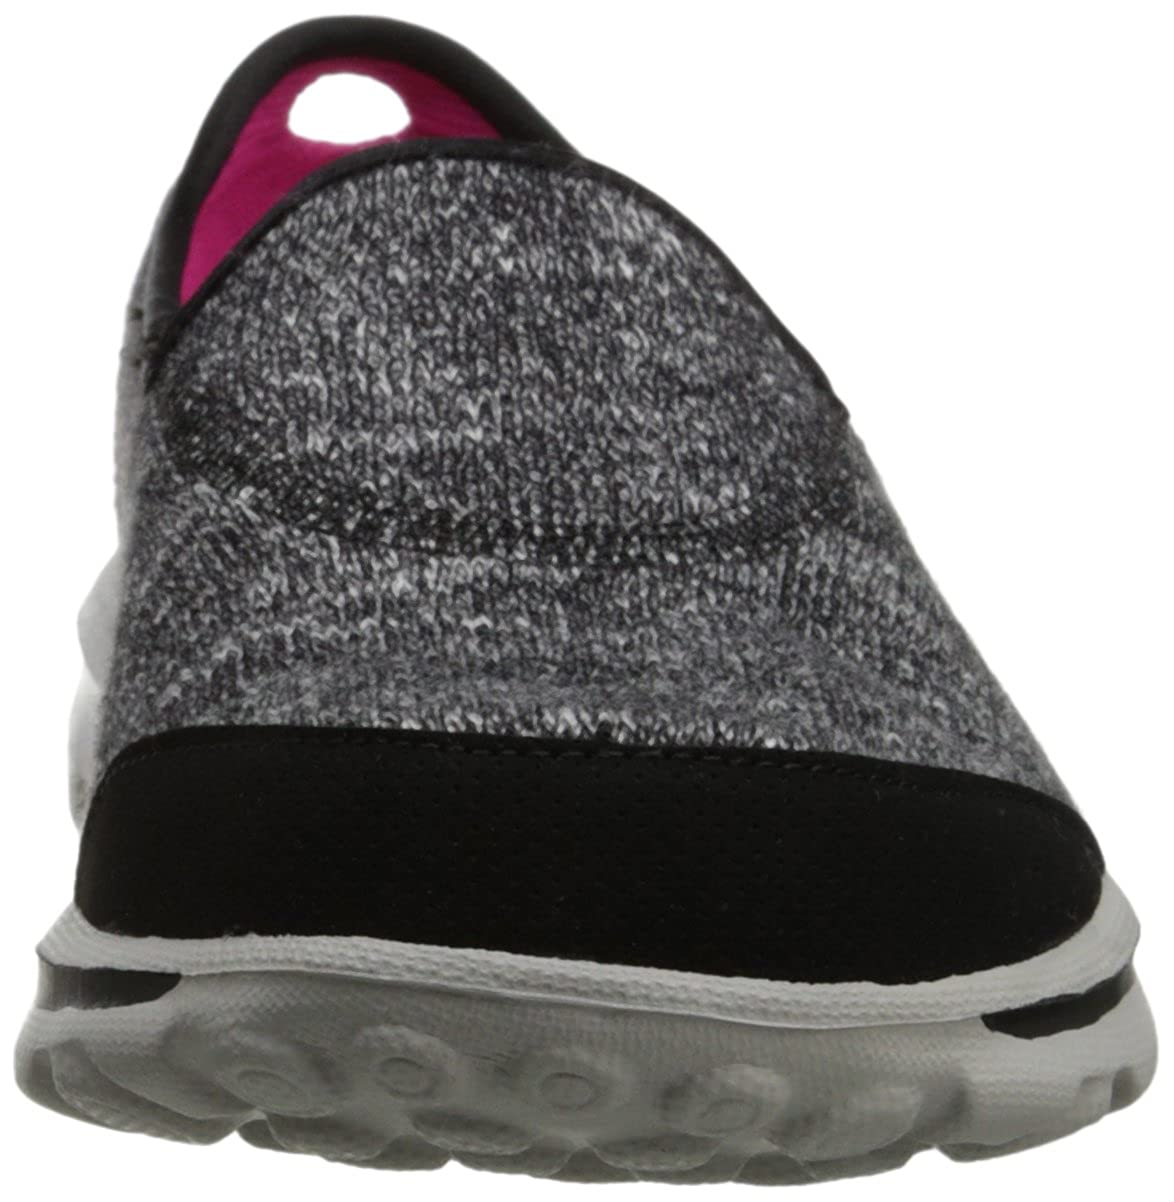 Skechers Performance Womens Go Walk Apres Slip On Shoes Black 5.5 M US 13760